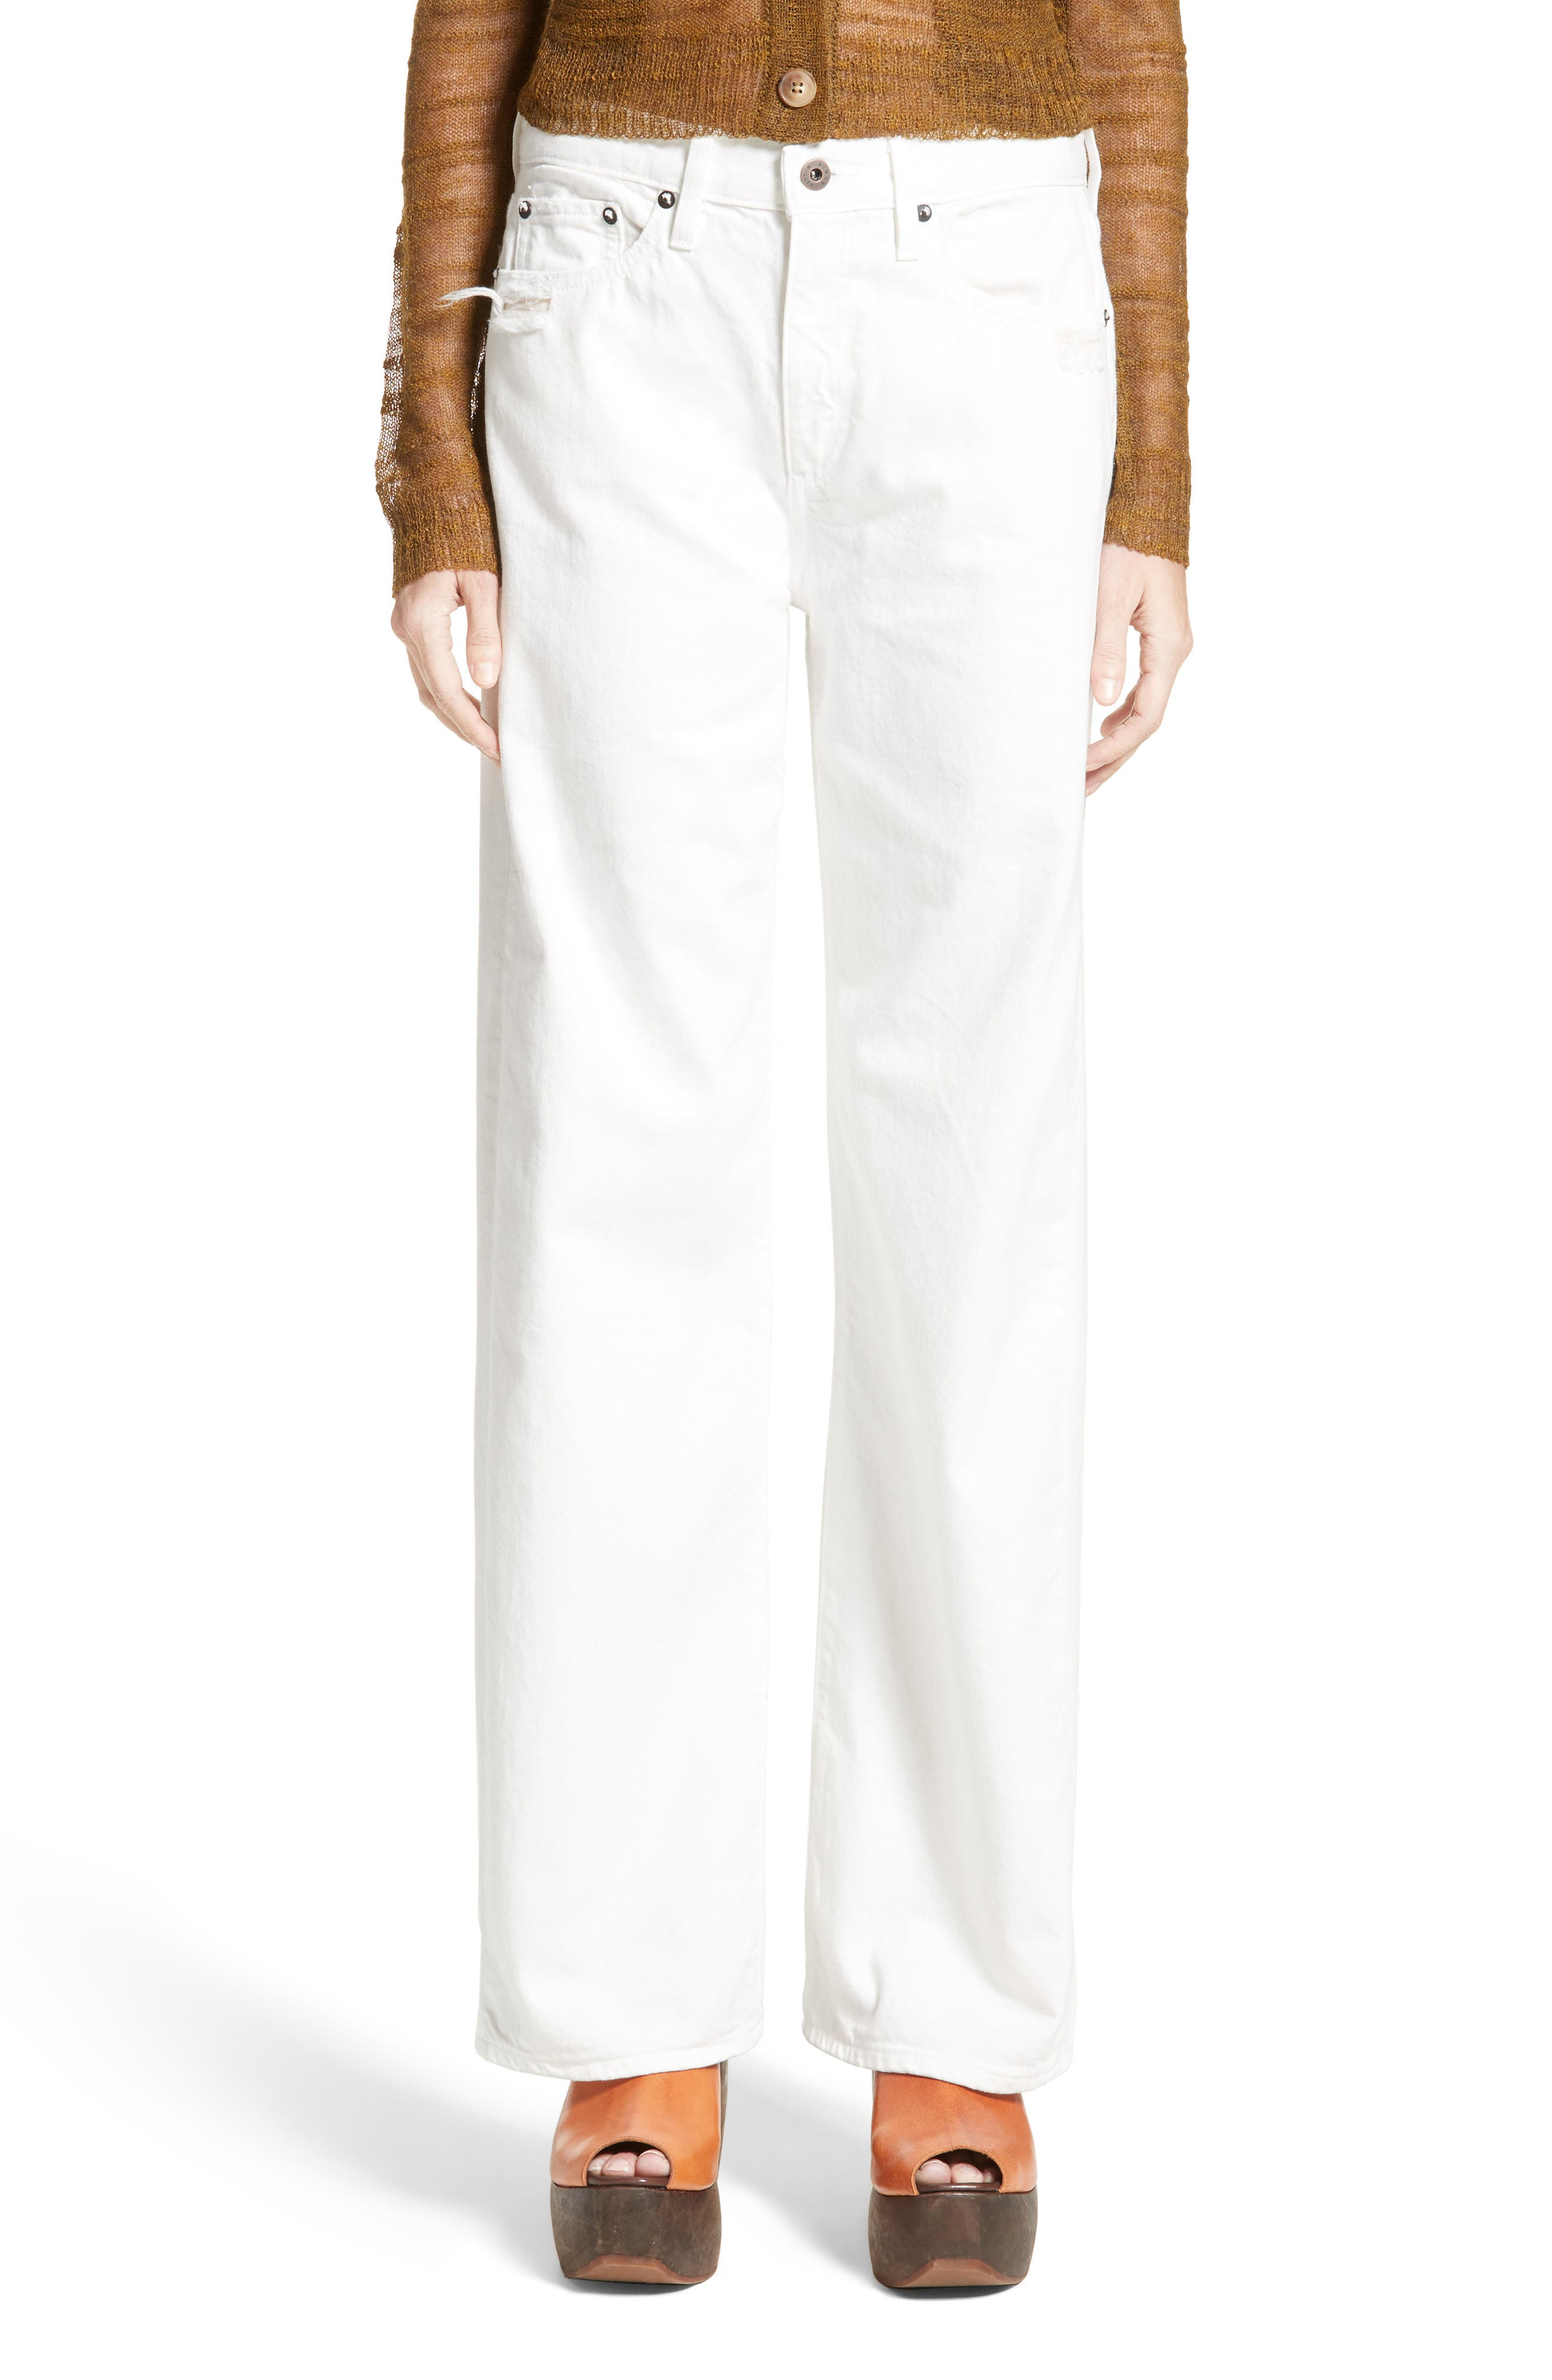 Latta Ankle Jeans,                         Main,                         color, 100